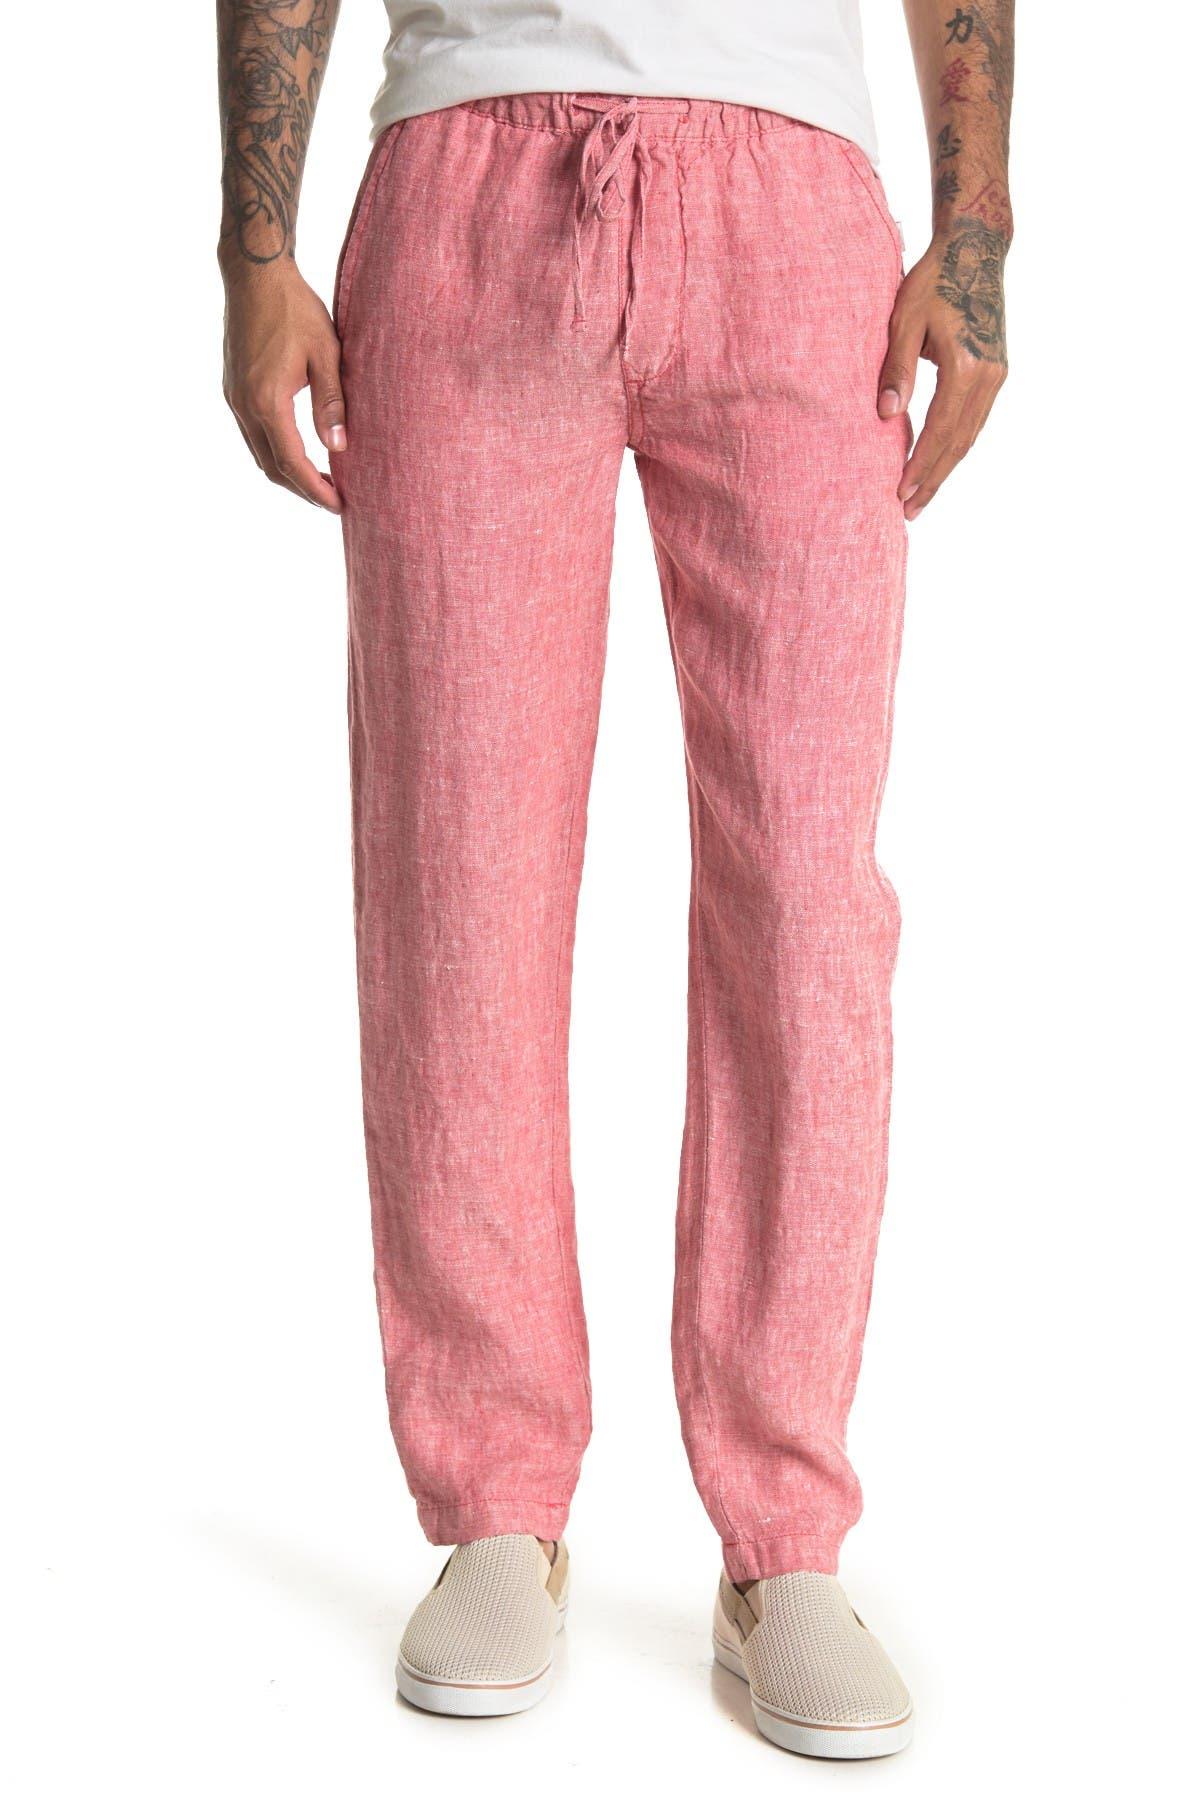 Image of Onia Carter Linen Pants